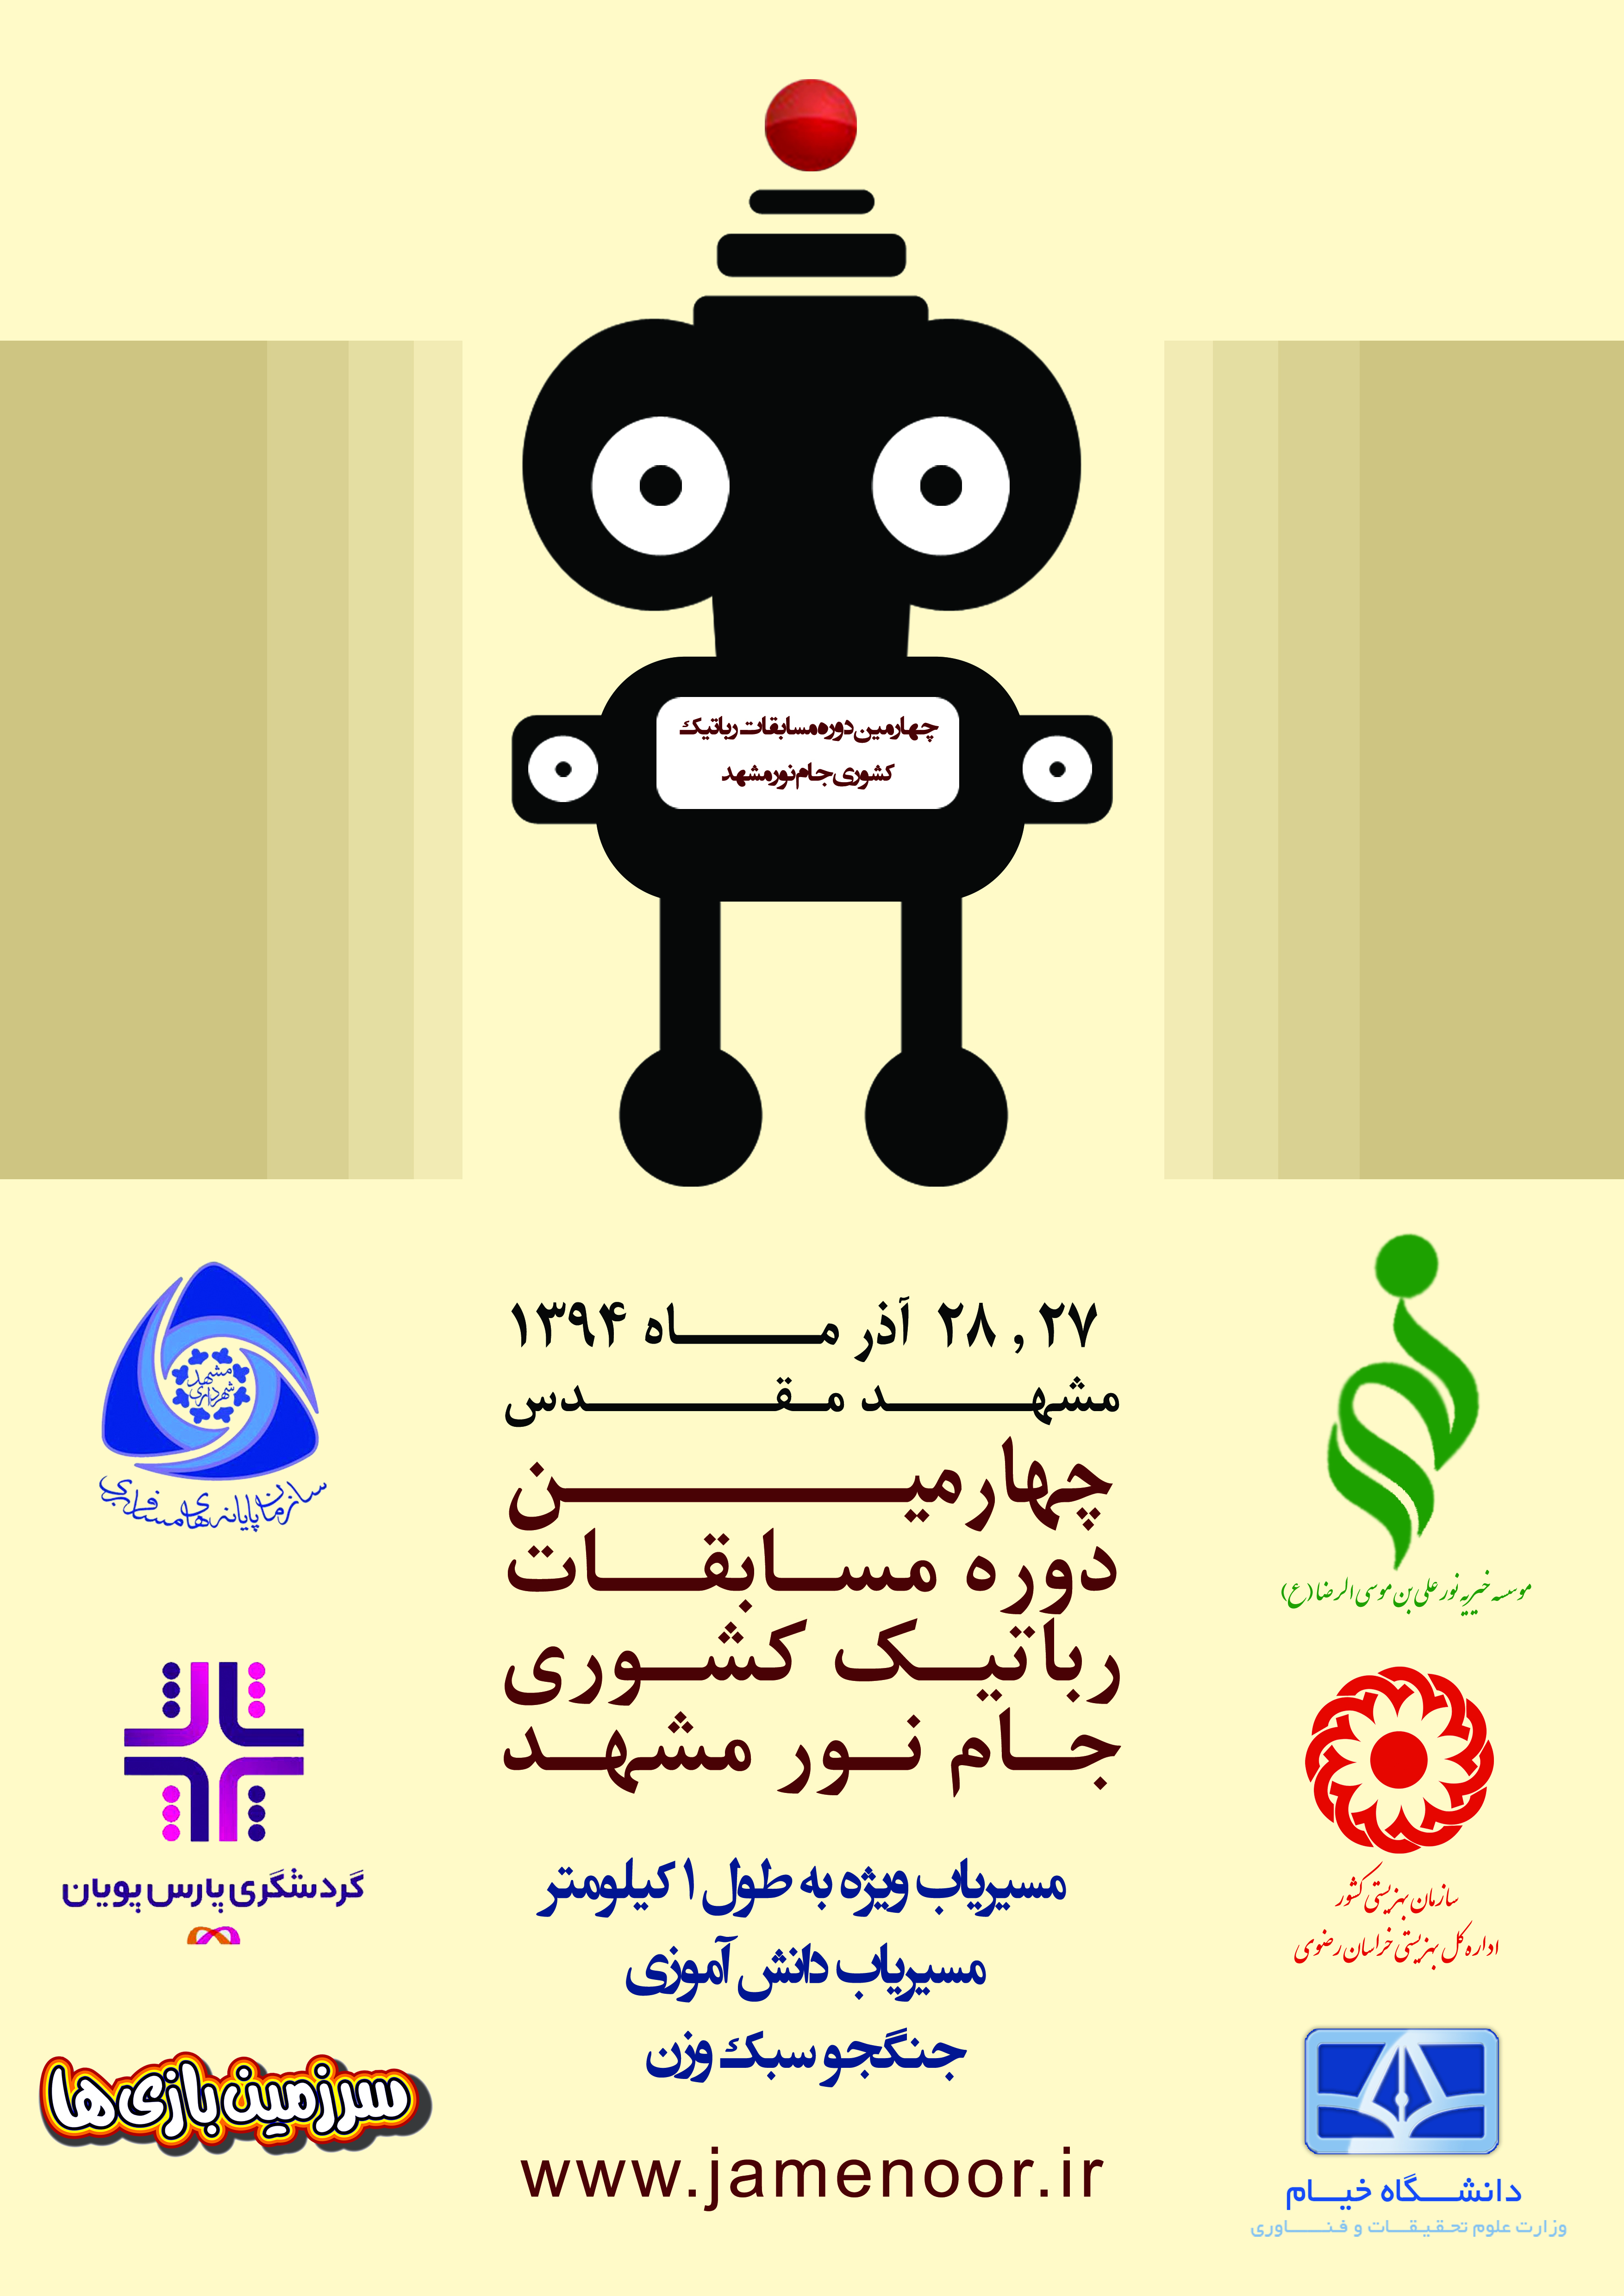 چهارمین دوره مسابقات کشوری جام نور مشهد